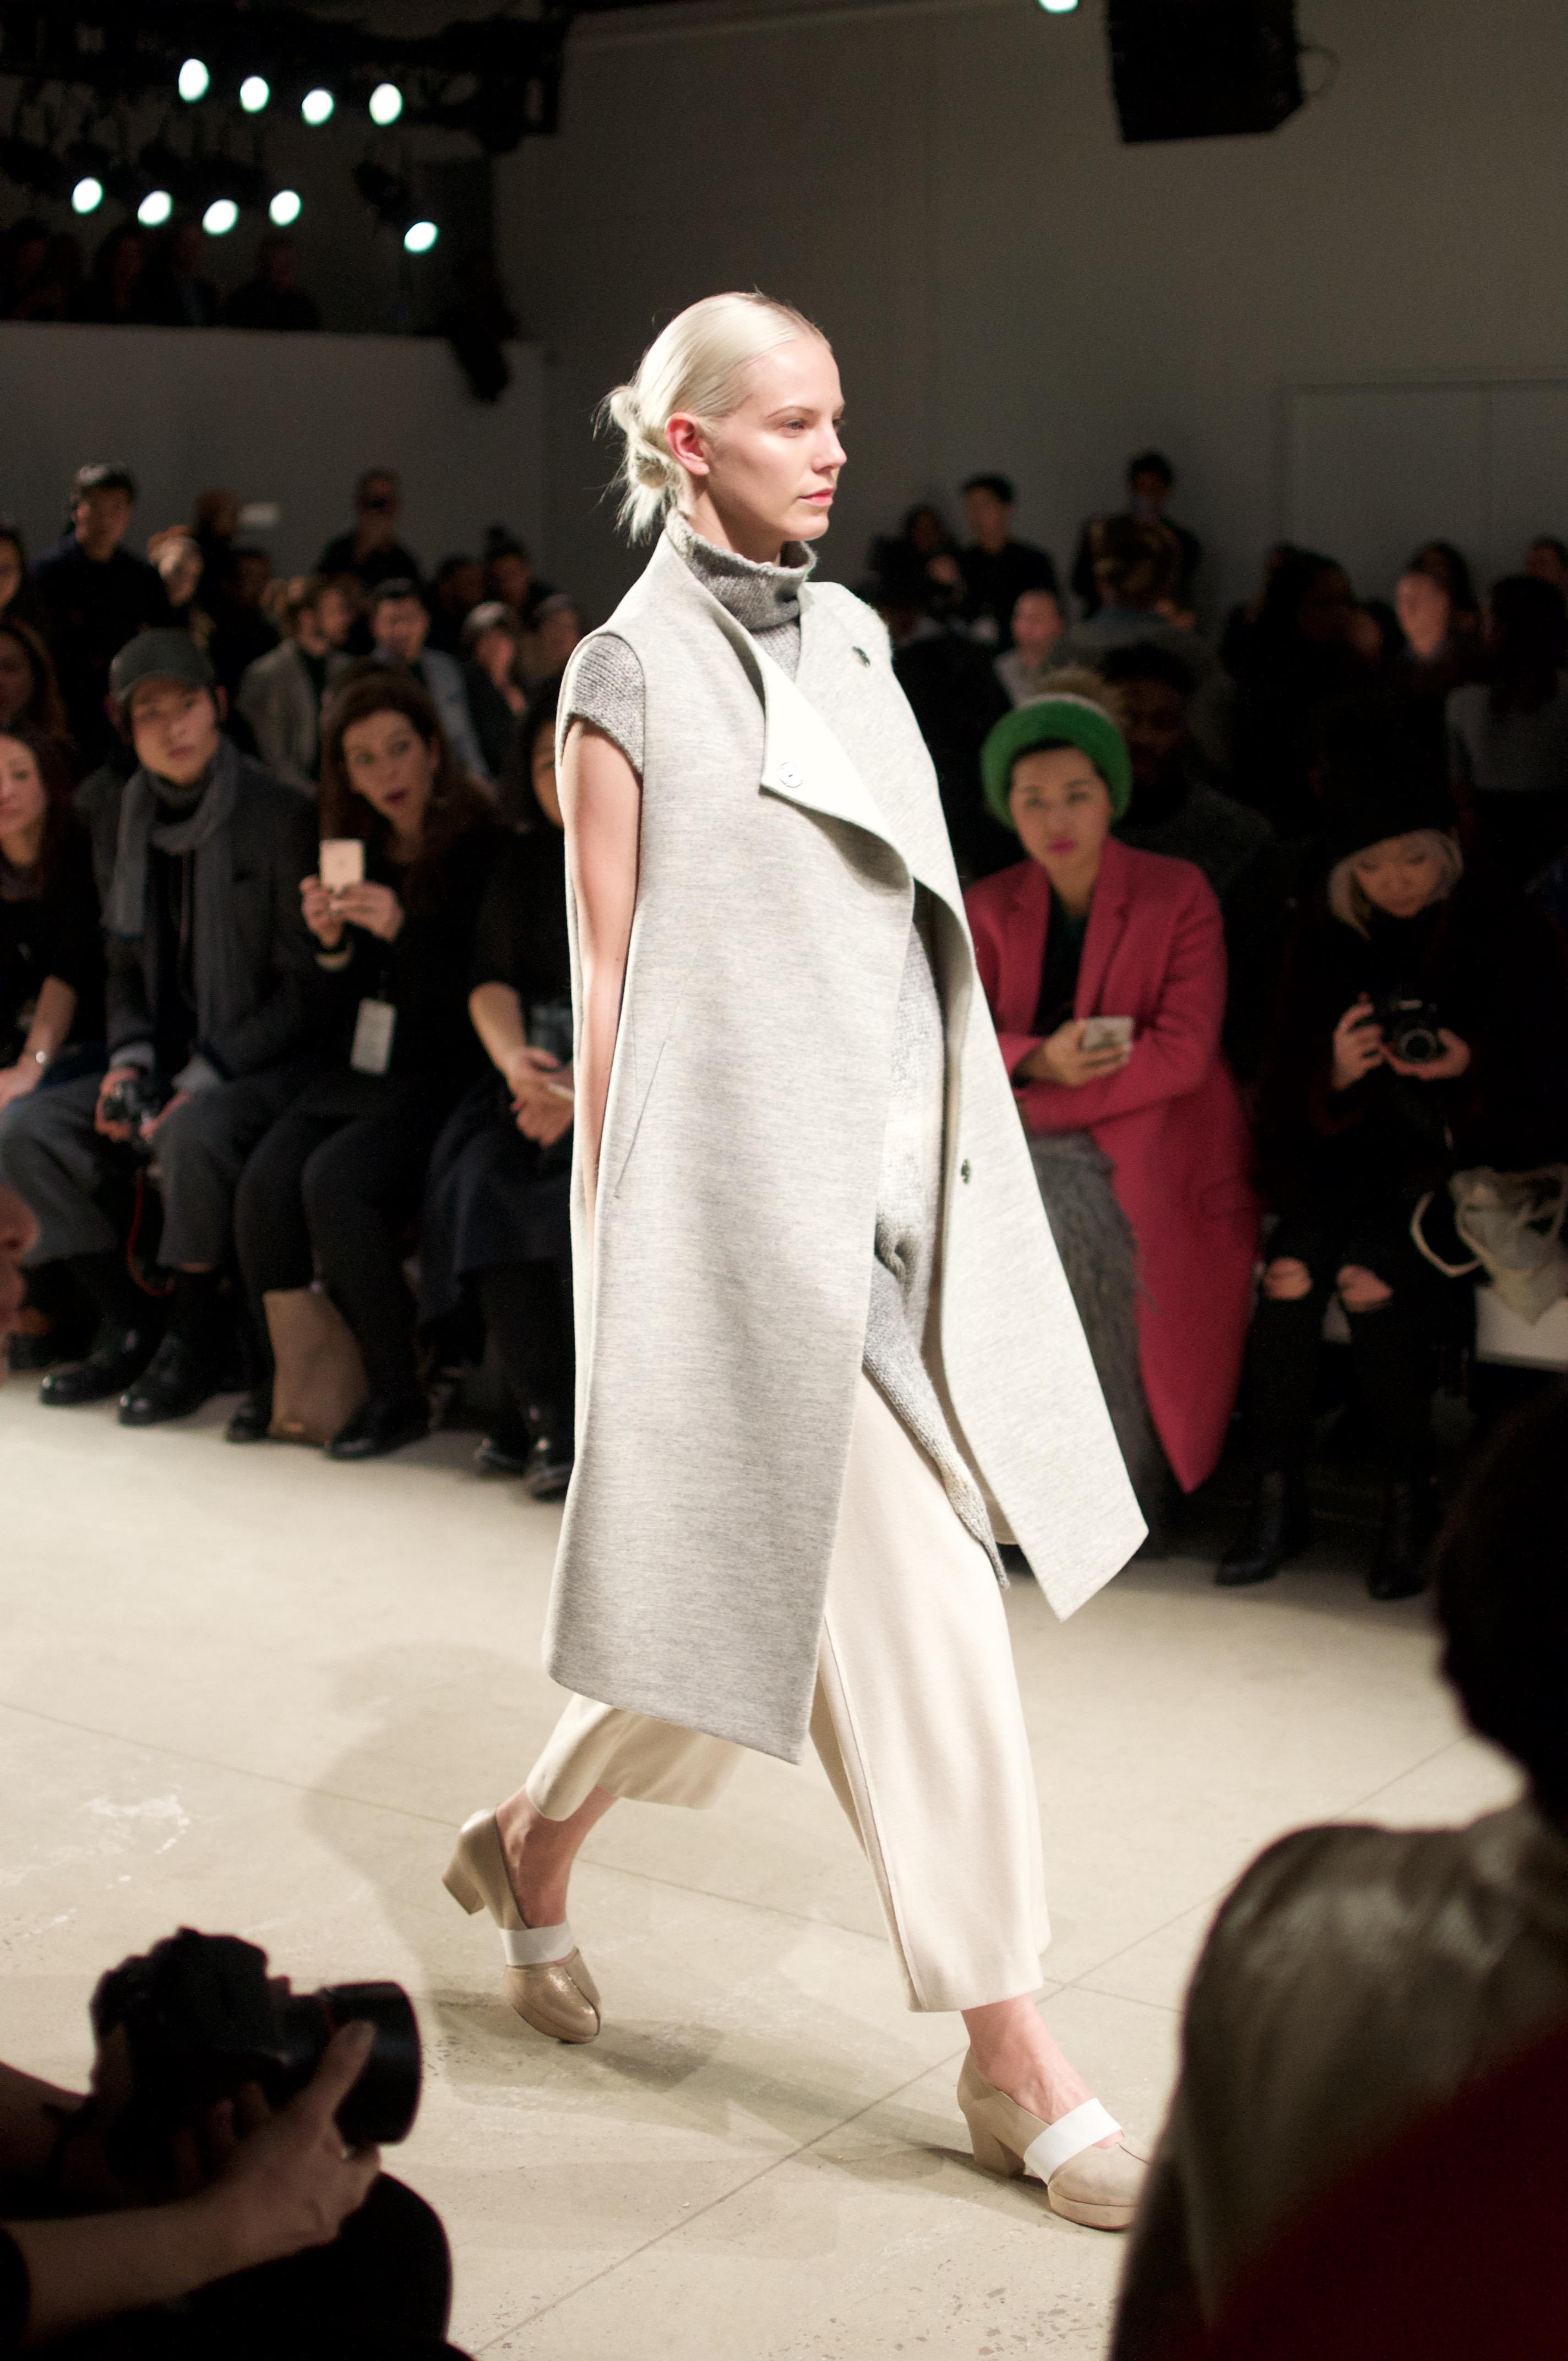 Demi Park Designer Runway Show